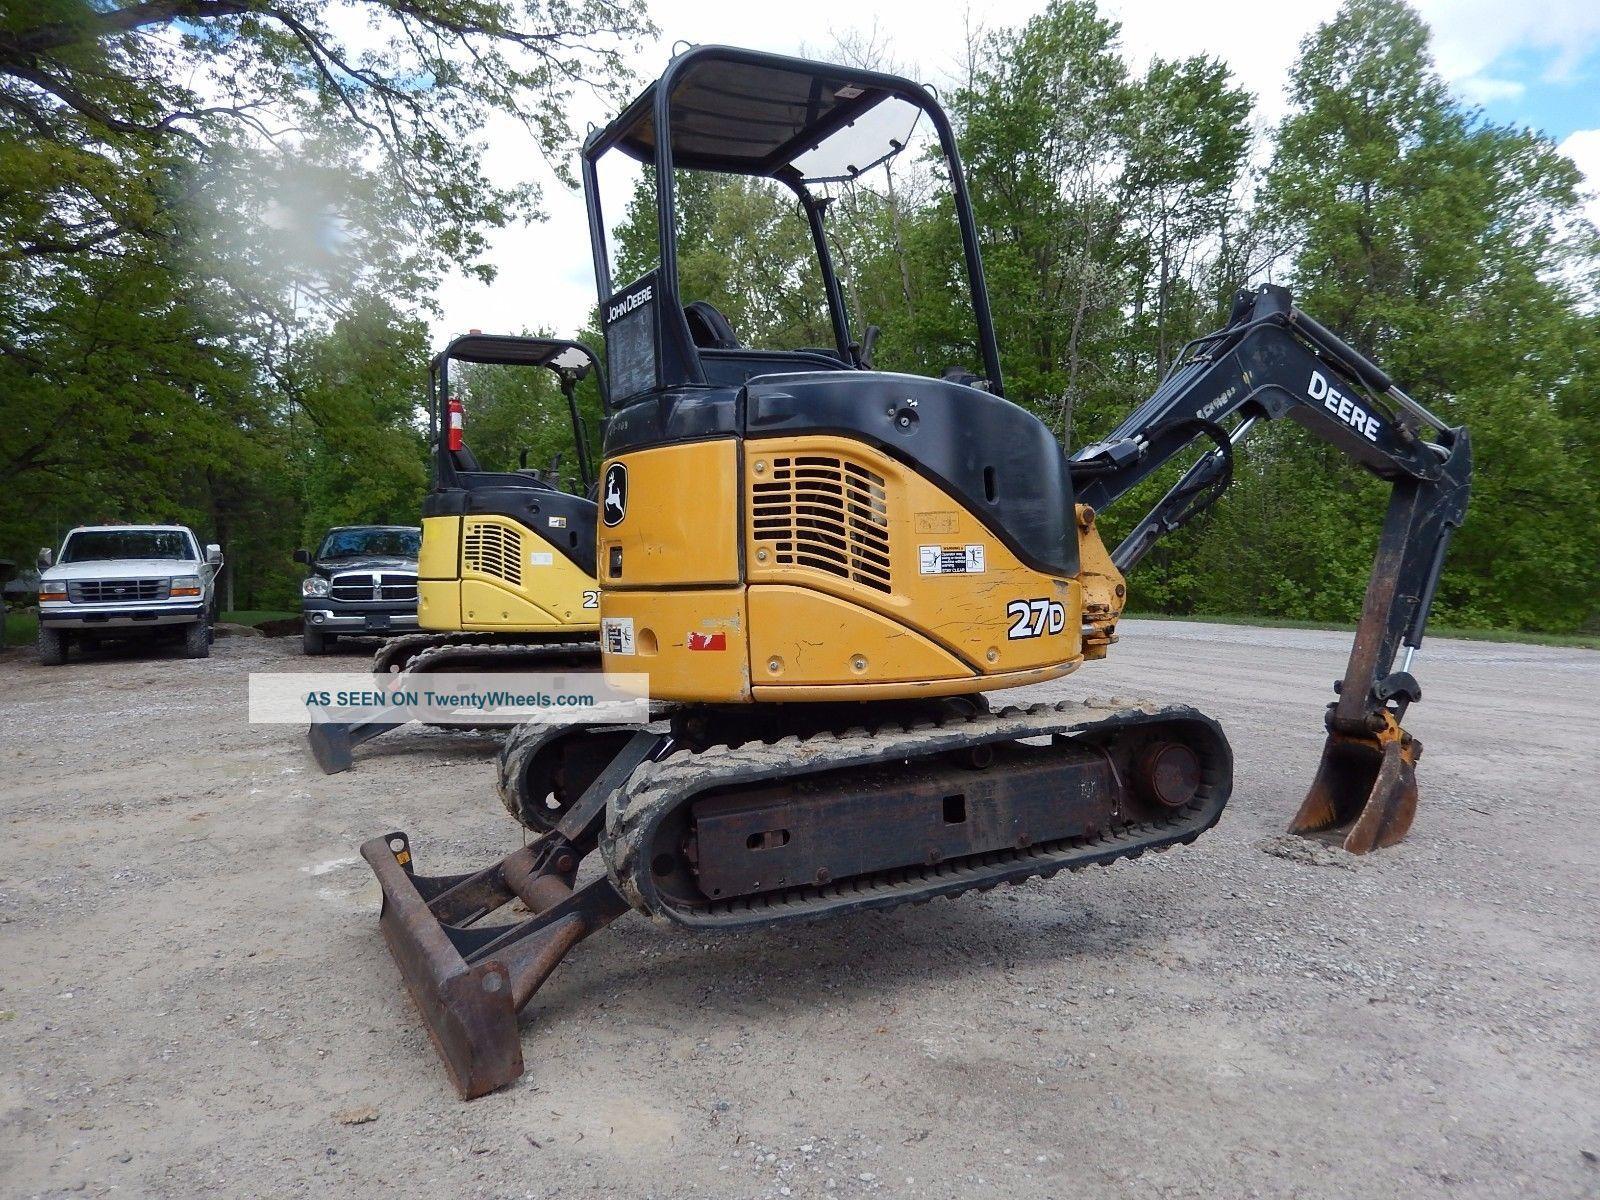 2008 John Deere 27d Mini Excavator Diesel Job Sight Ready Shape Low Hour Excavators photo